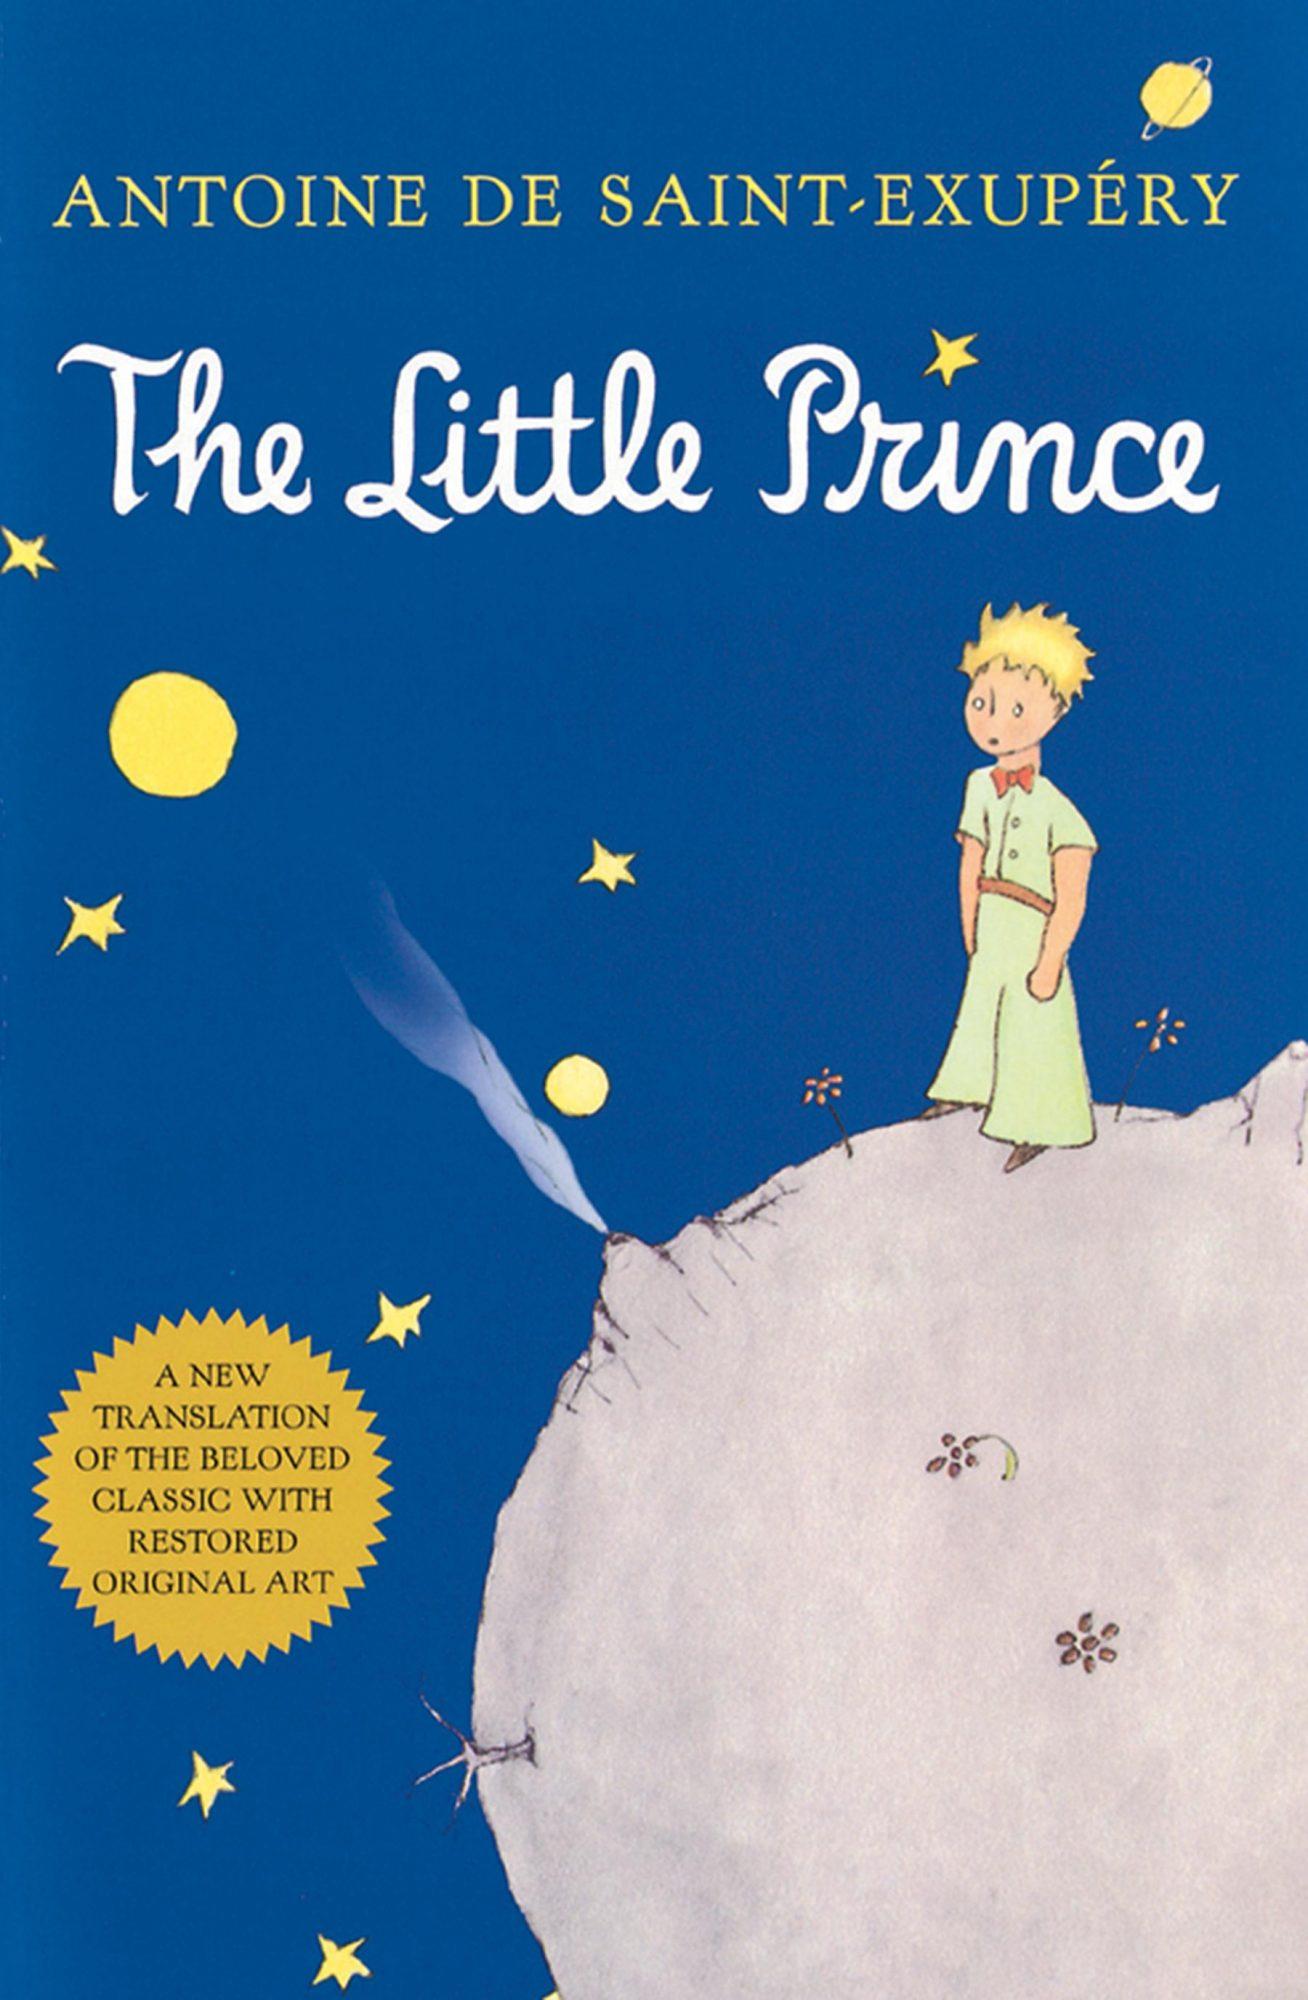 The Little Princeby Antoine de Saint-Exupery, Richard Howard (Translator)